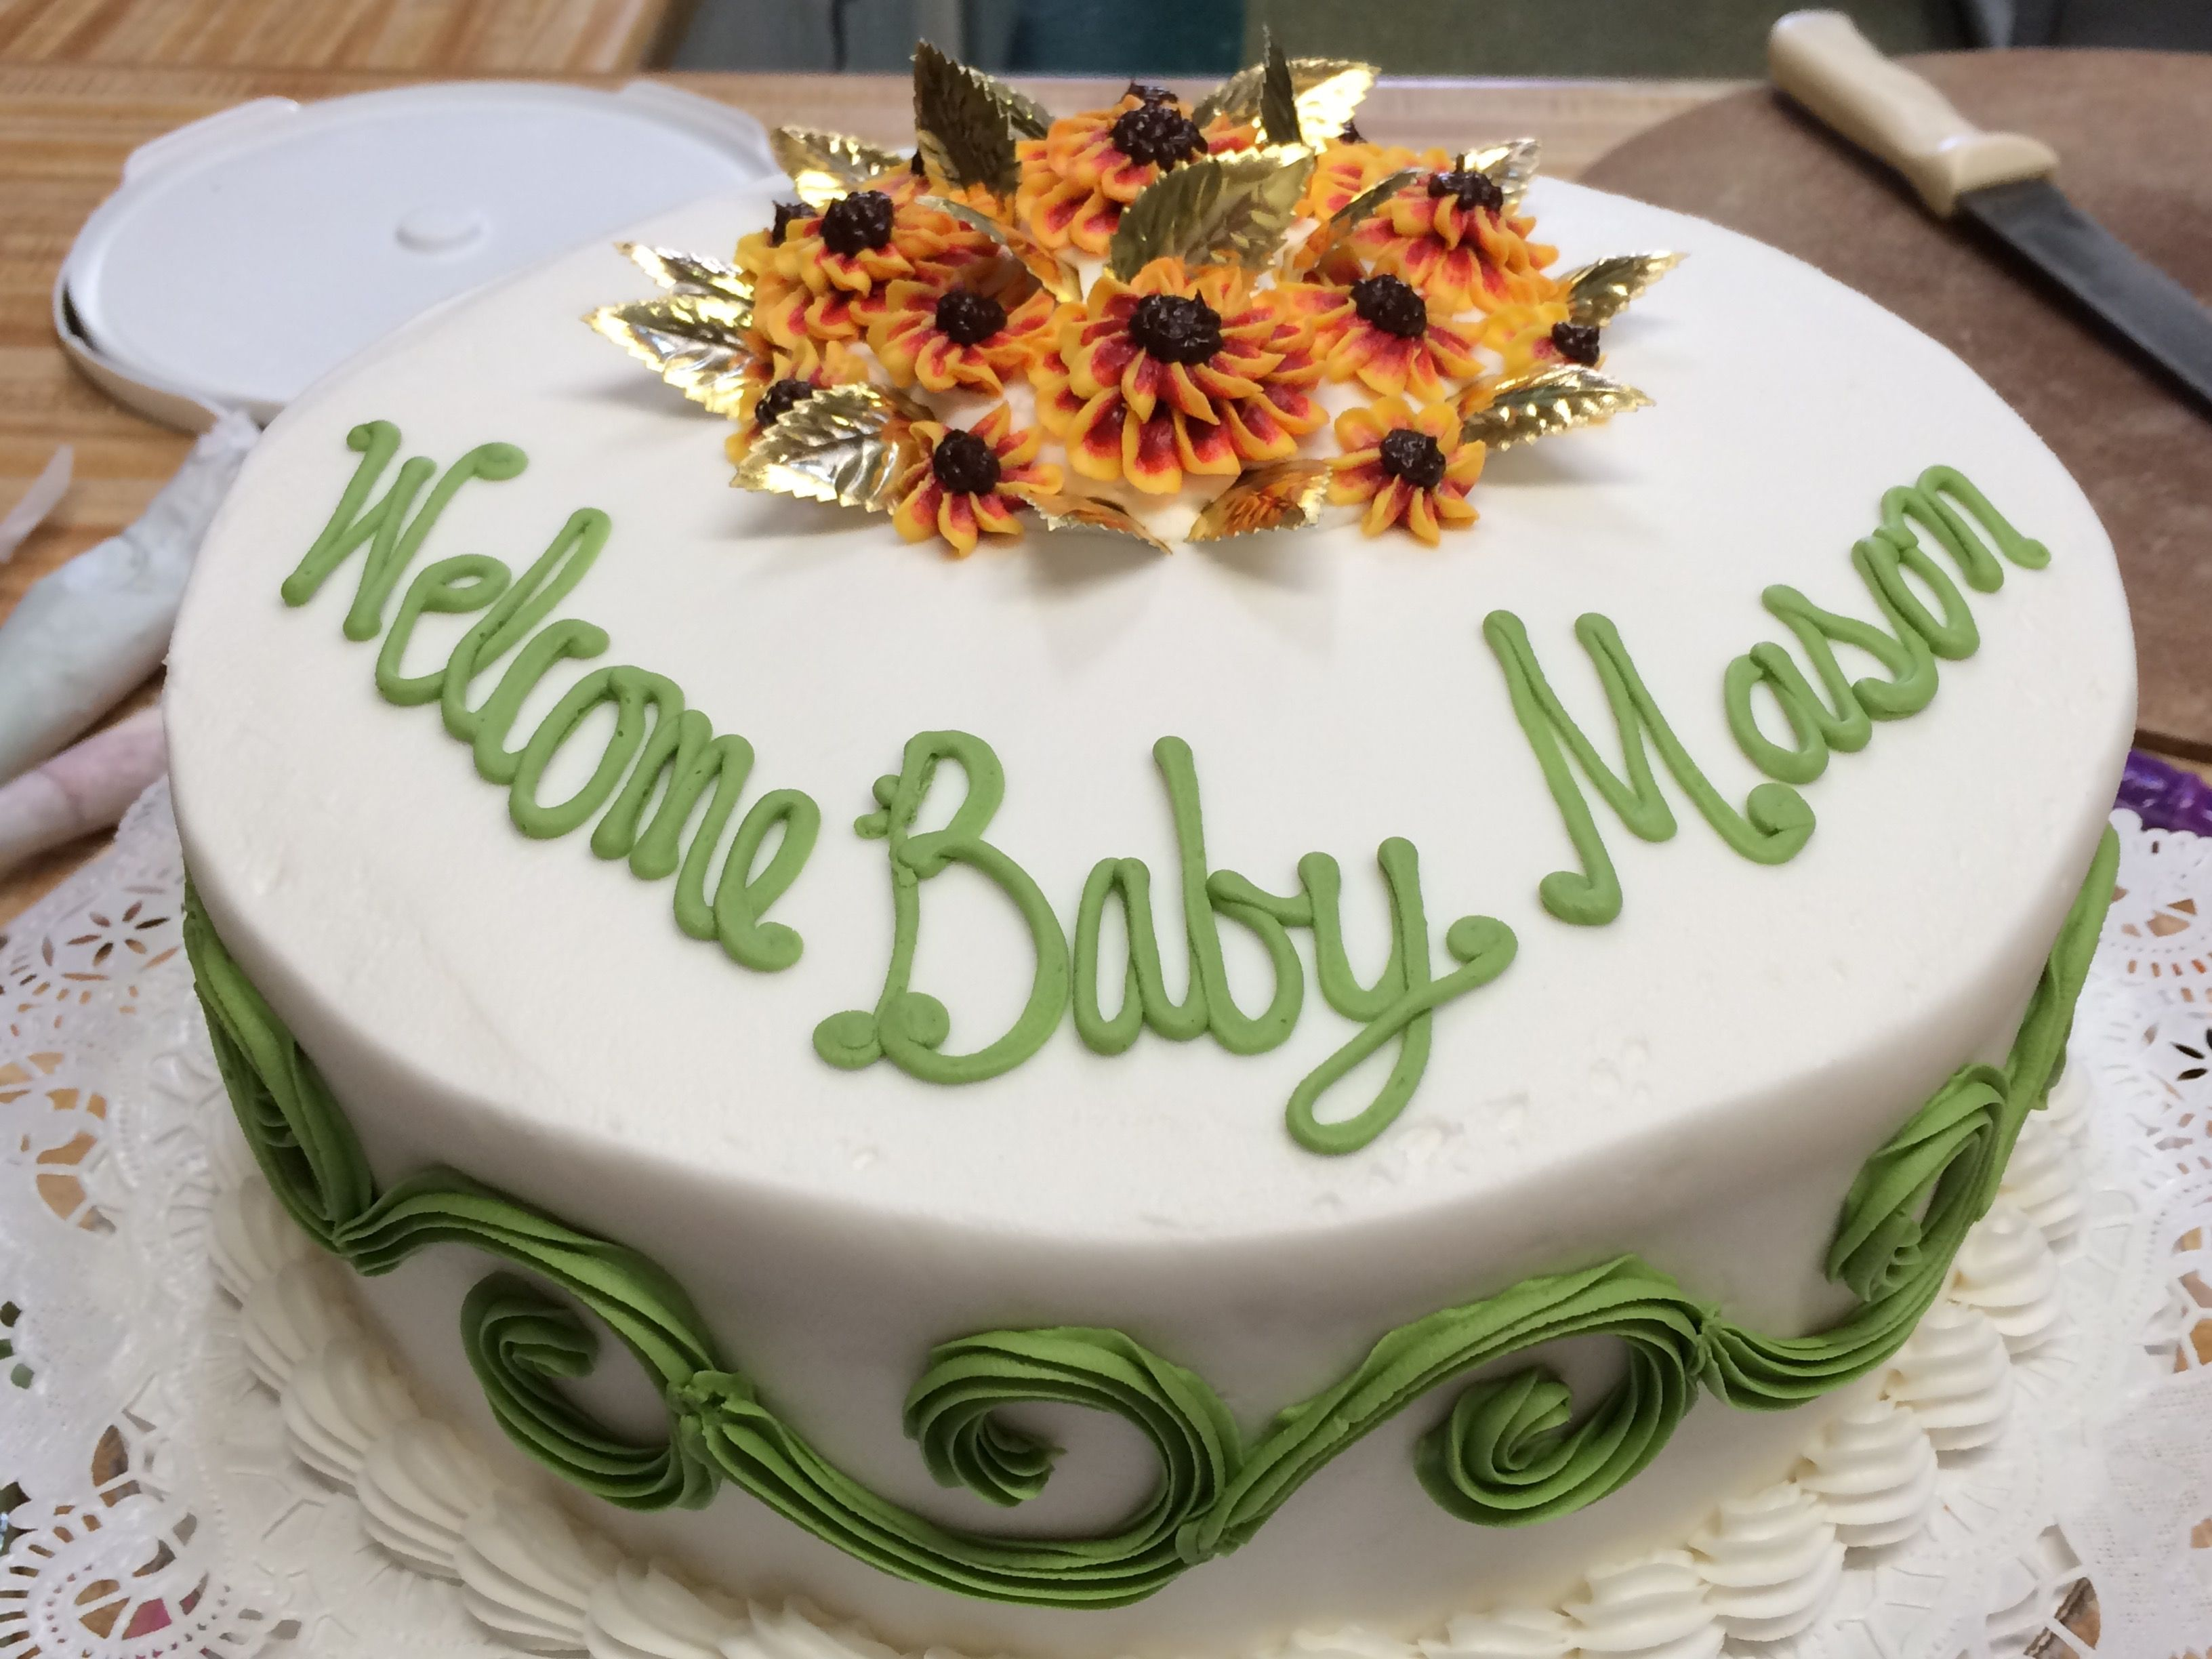 Baby Shower Cake, Richmond VA, Westhampton Pastry Shop ...